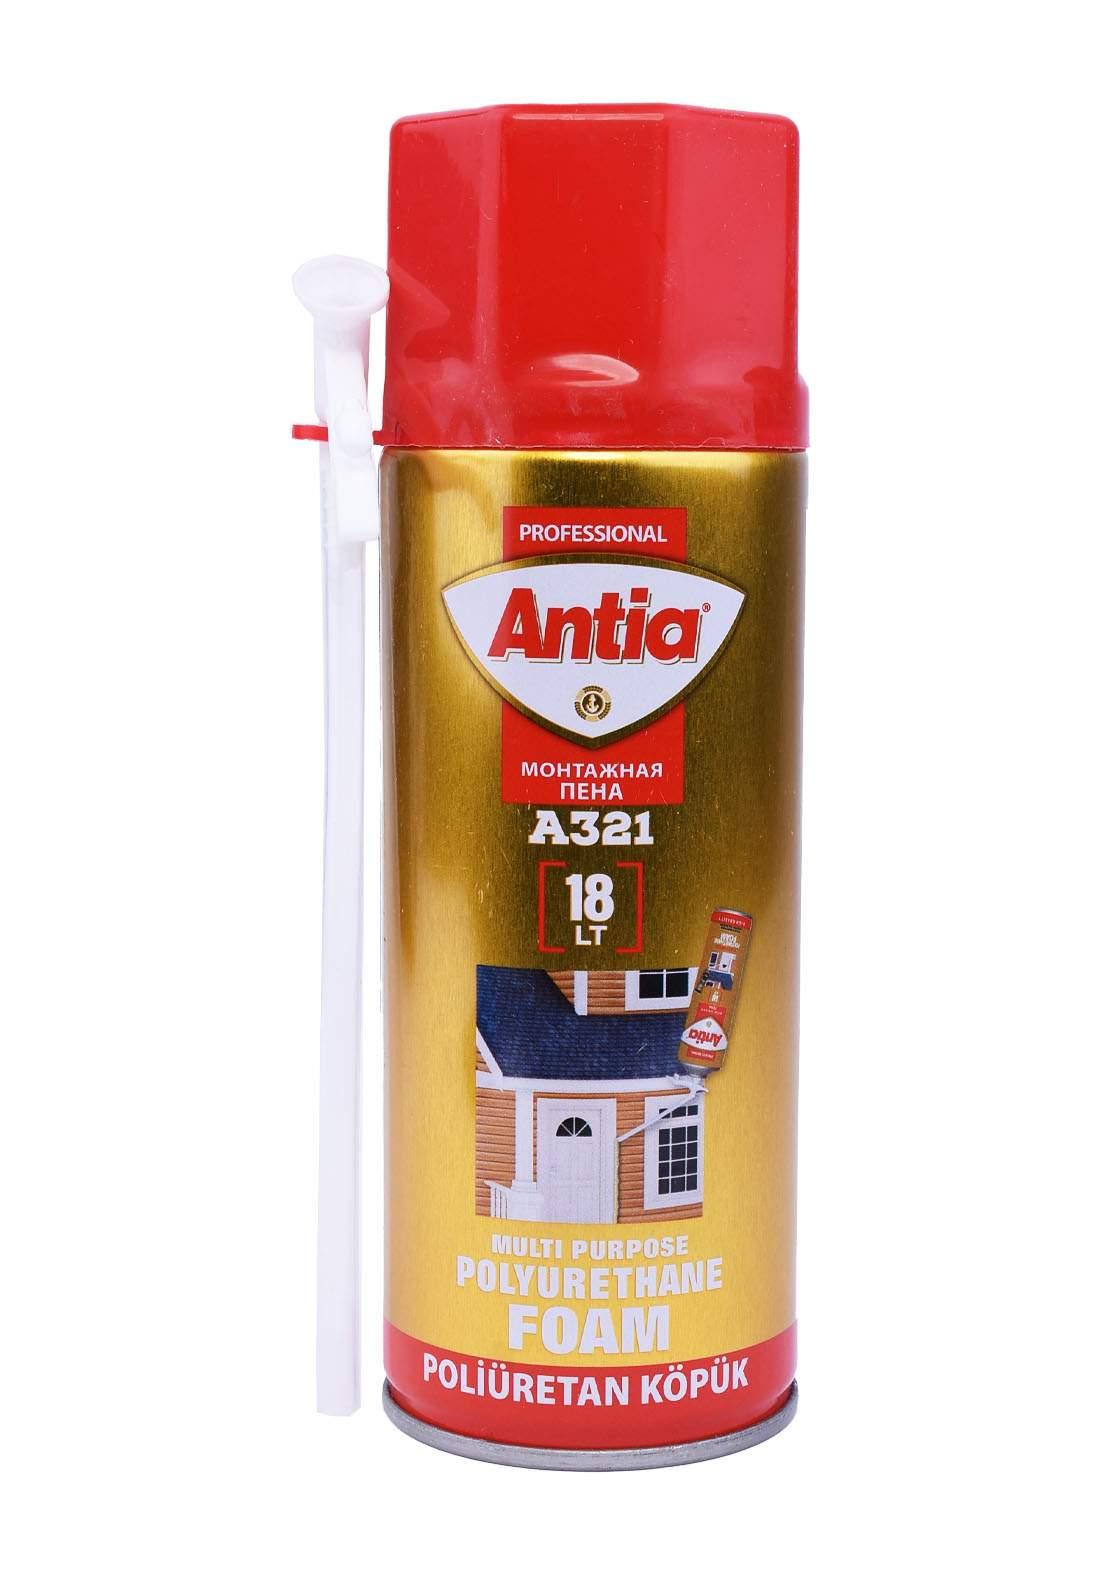 Antia An-K7233 Multi Porpose Polyurethane Fome A321 300ml فوم